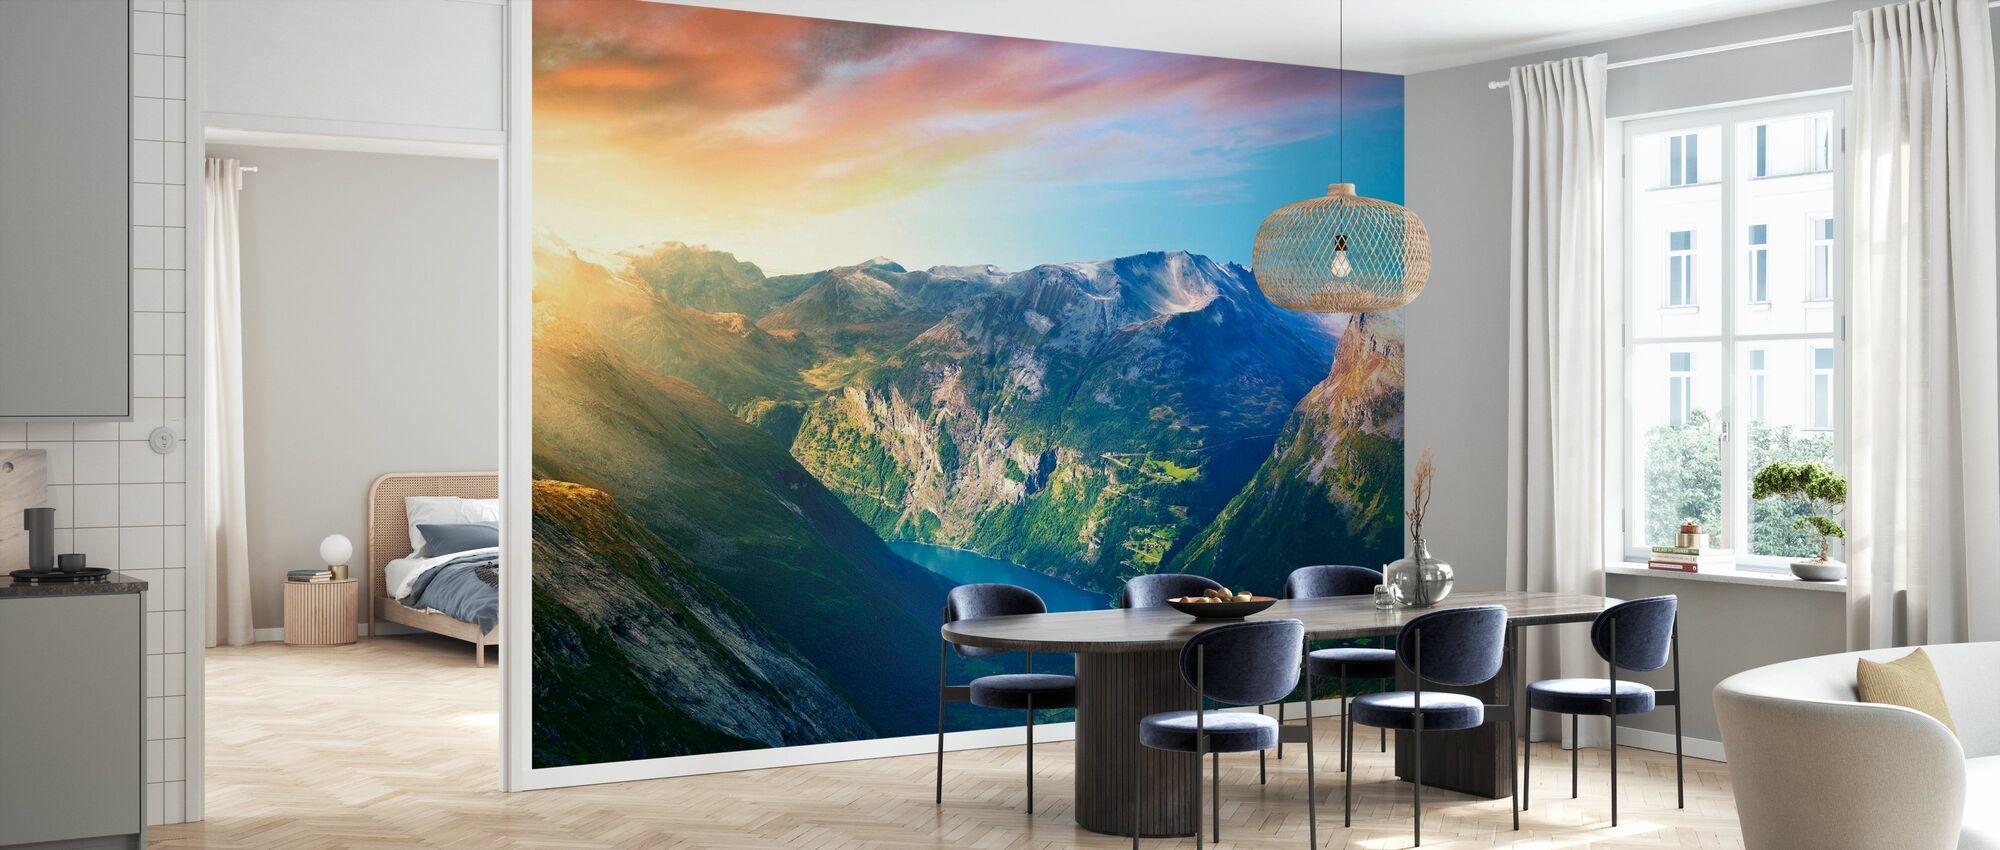 Sunrise over Geirangerfjord, Norway - Wallpaper - Kitchen